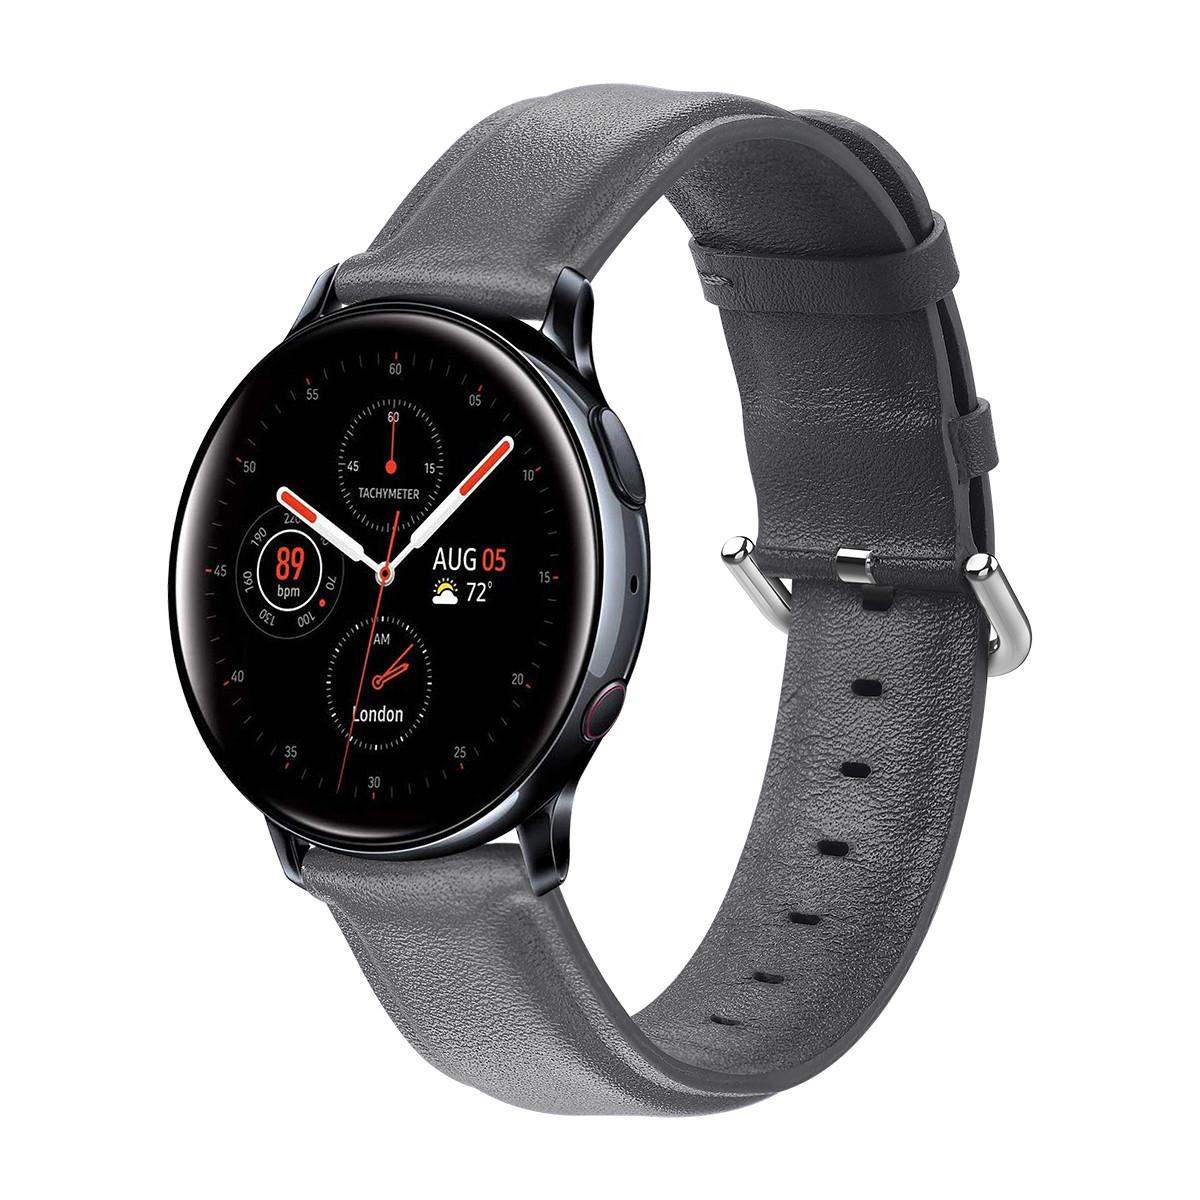 Ремінець BeWatch шкіряний 20мм для Samsung Active| Active 2 | Galaxy watch 42mm Сірий L (1220104.L)